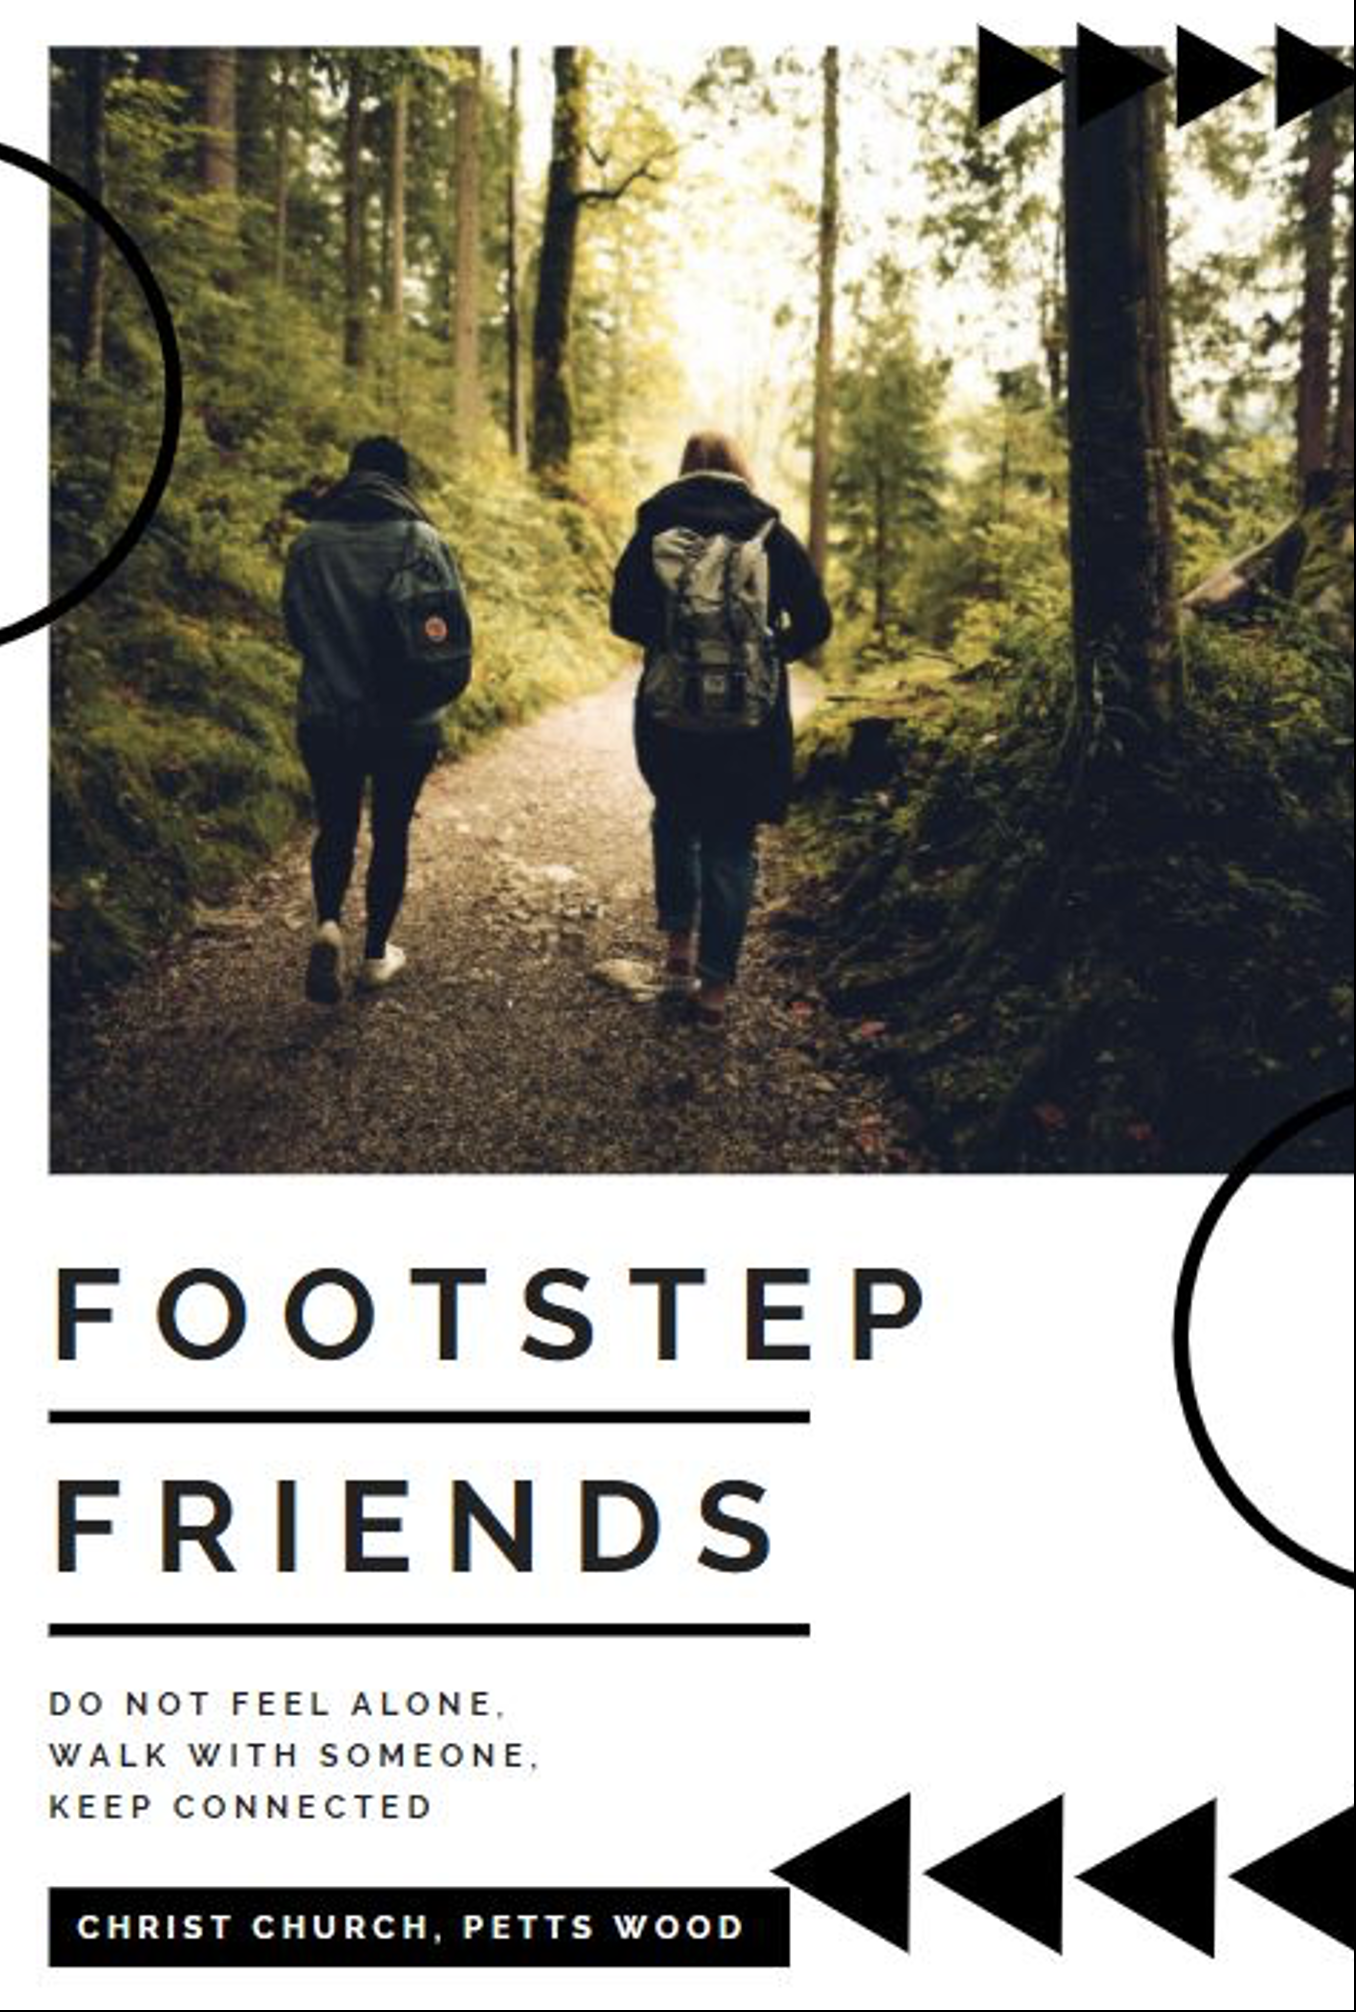 Footstep Friends @ Christ Church